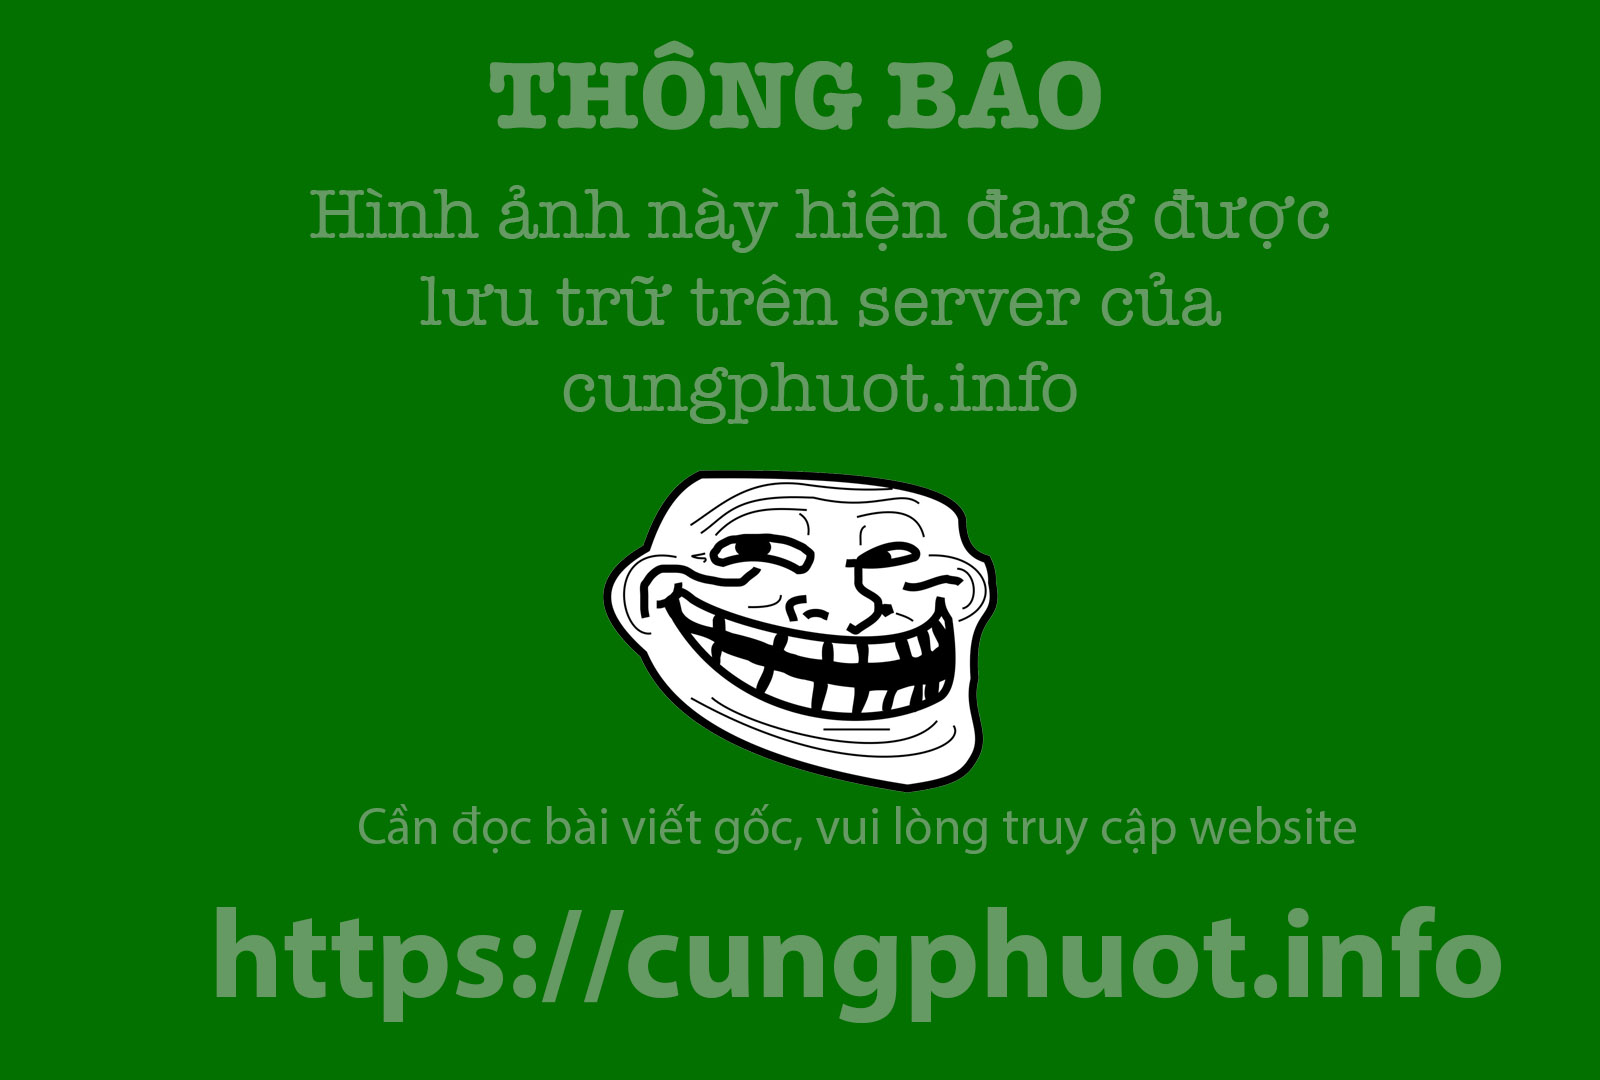 Vuon hoa tam giac mach o Ninh Binh hinh anh 7